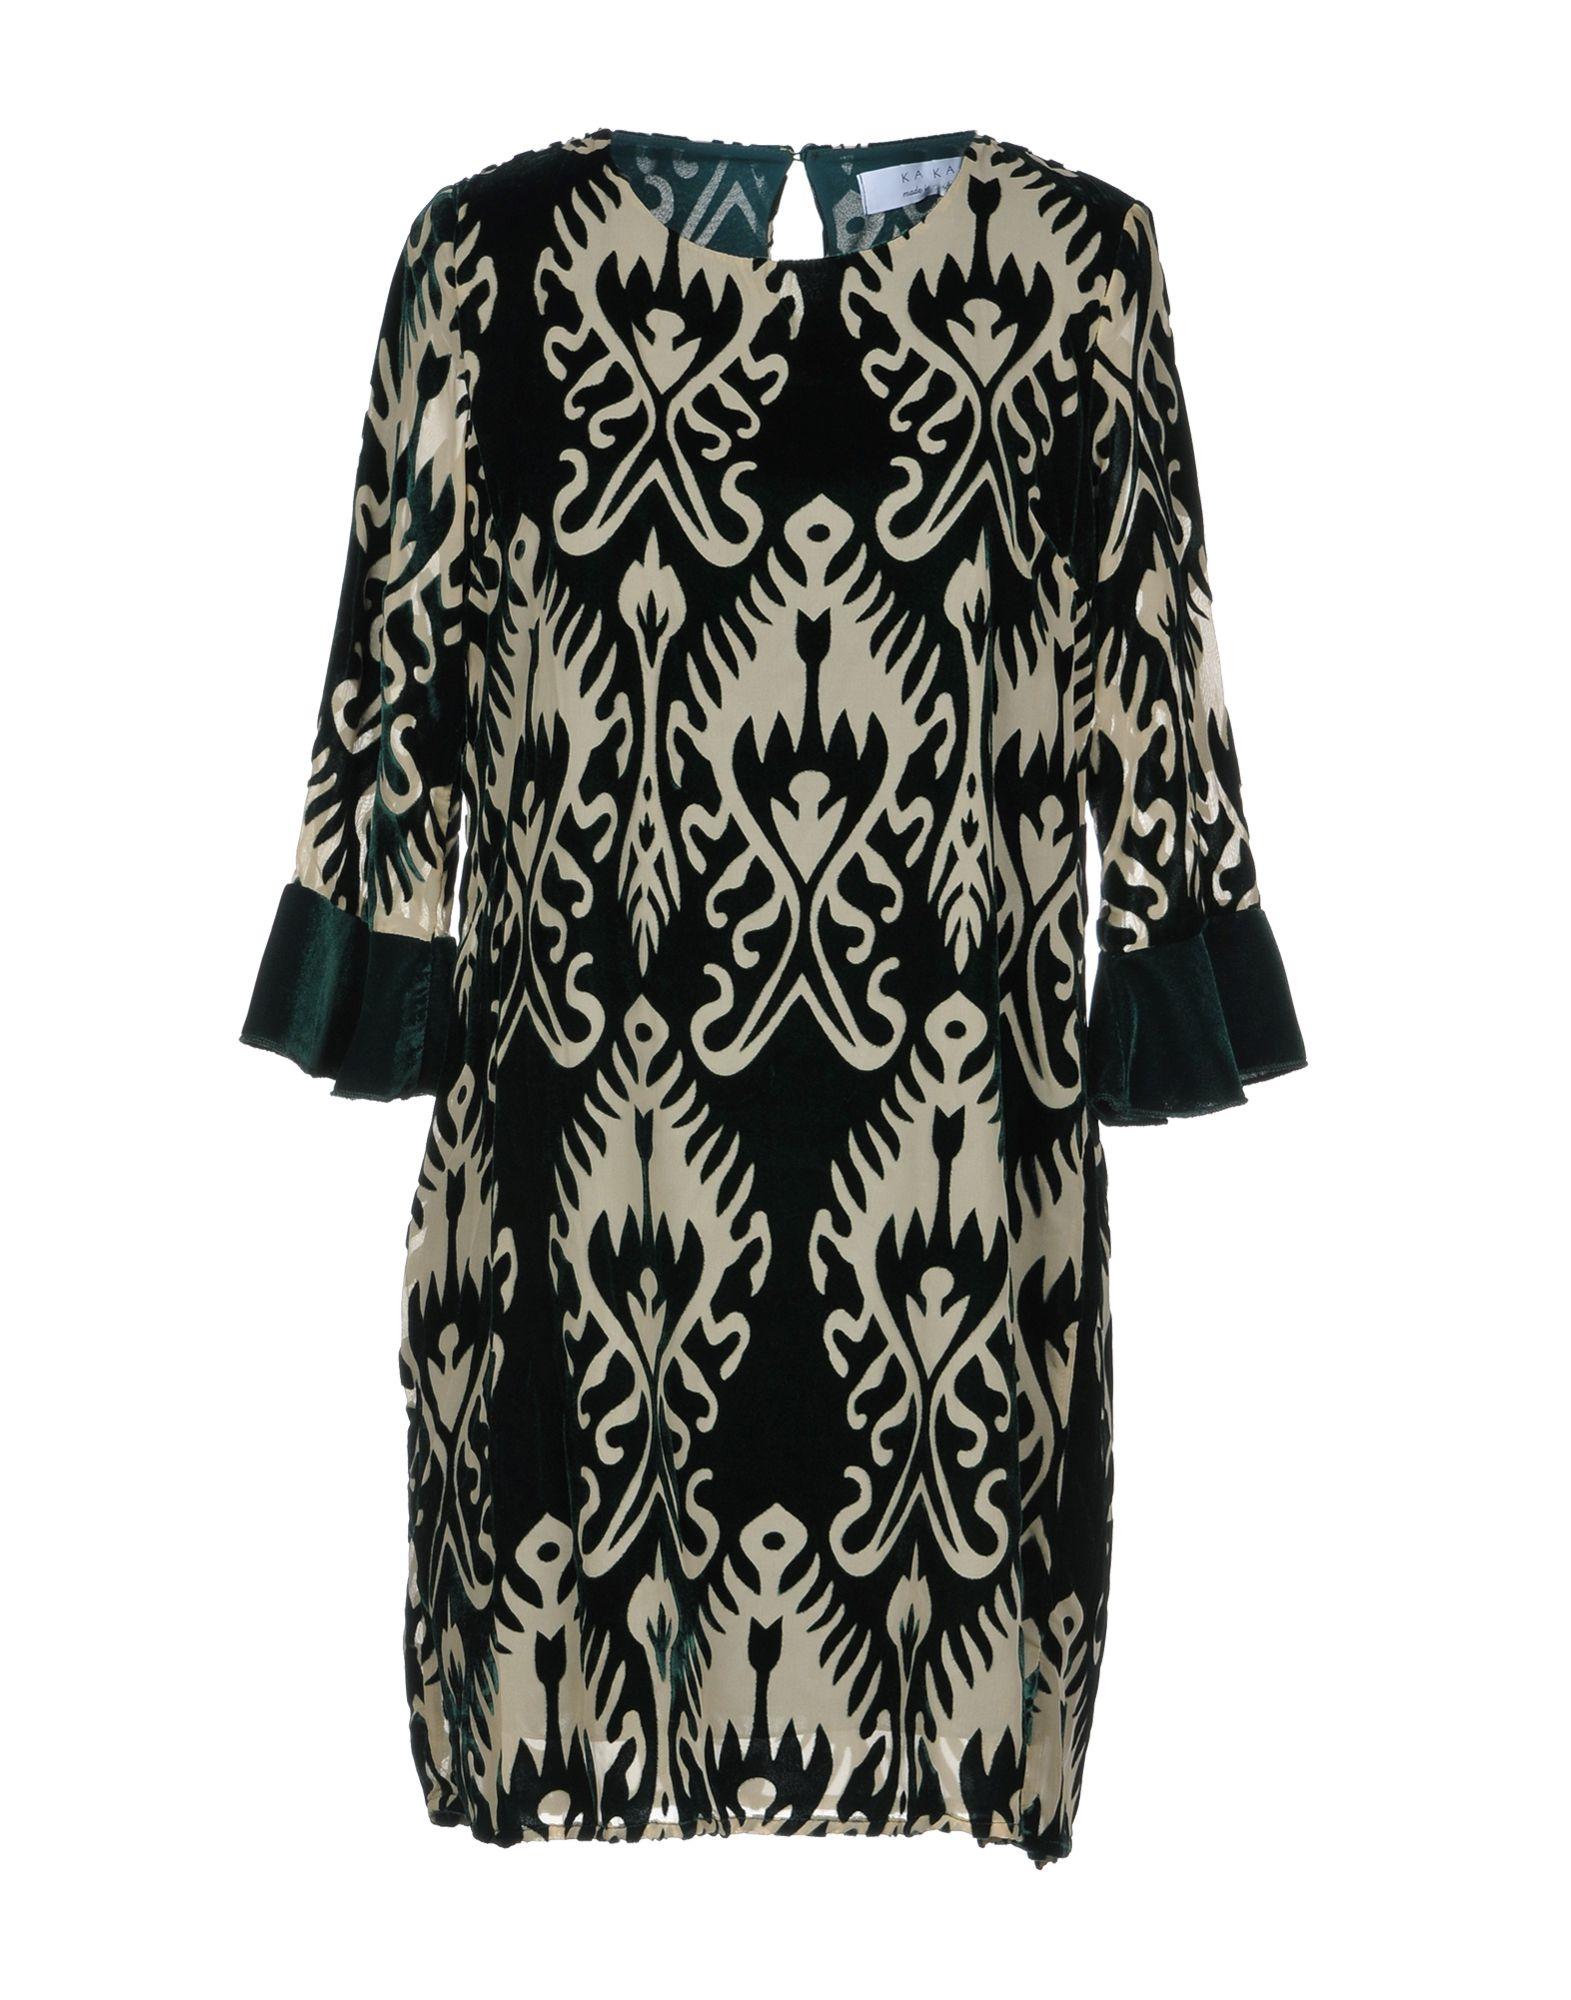 Robe Courte Femme KaosVente En Ligne OPwkn0